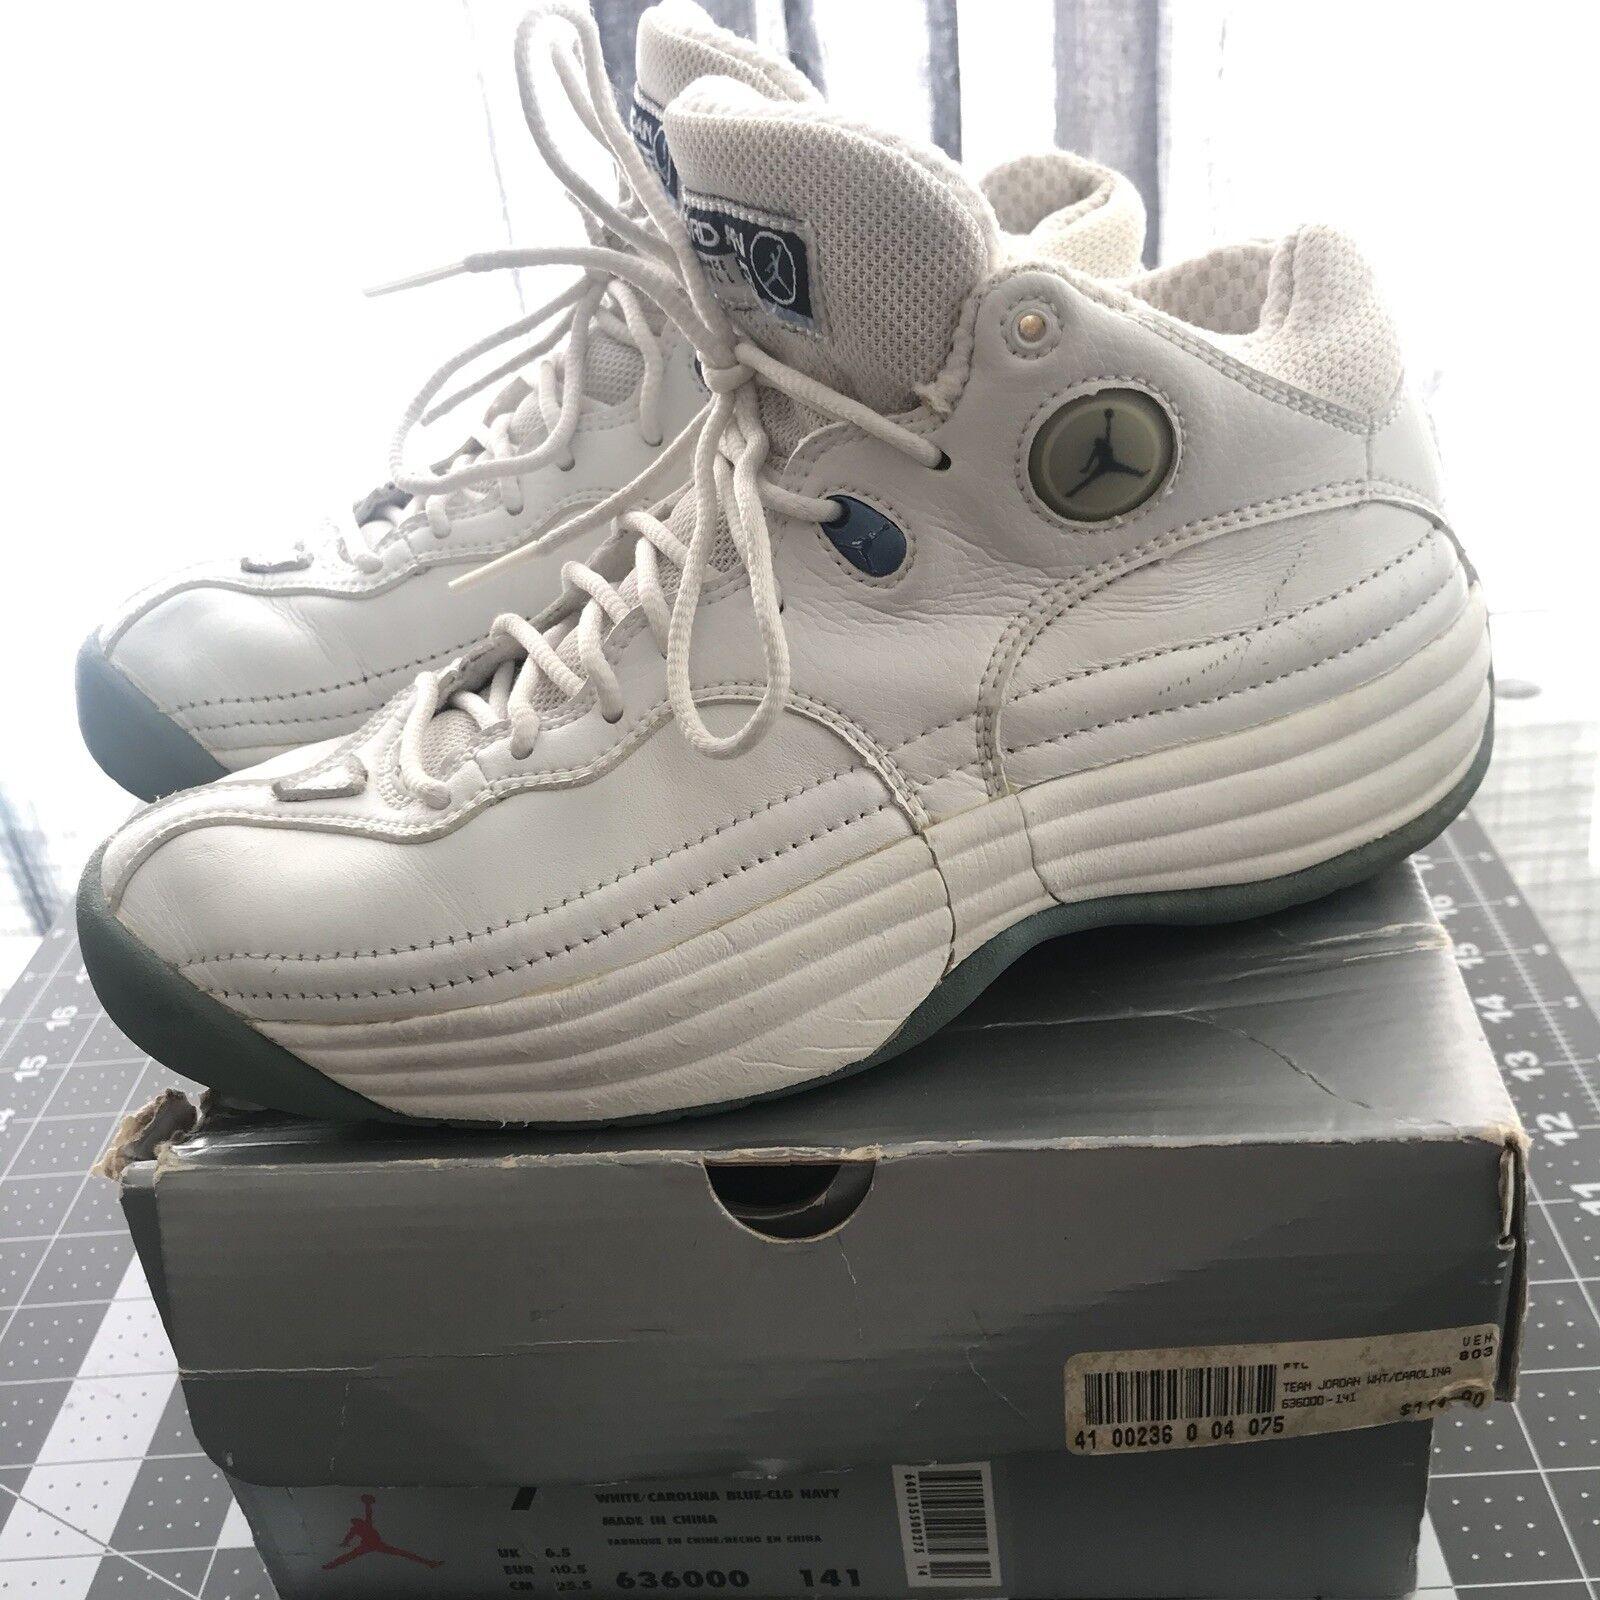 huge selection of 85ea3 3a874 20d0d 38476  amazon 1998 der nike air jordan jumpman weiß team 1 weiß  jumpman navy blau 636000 141